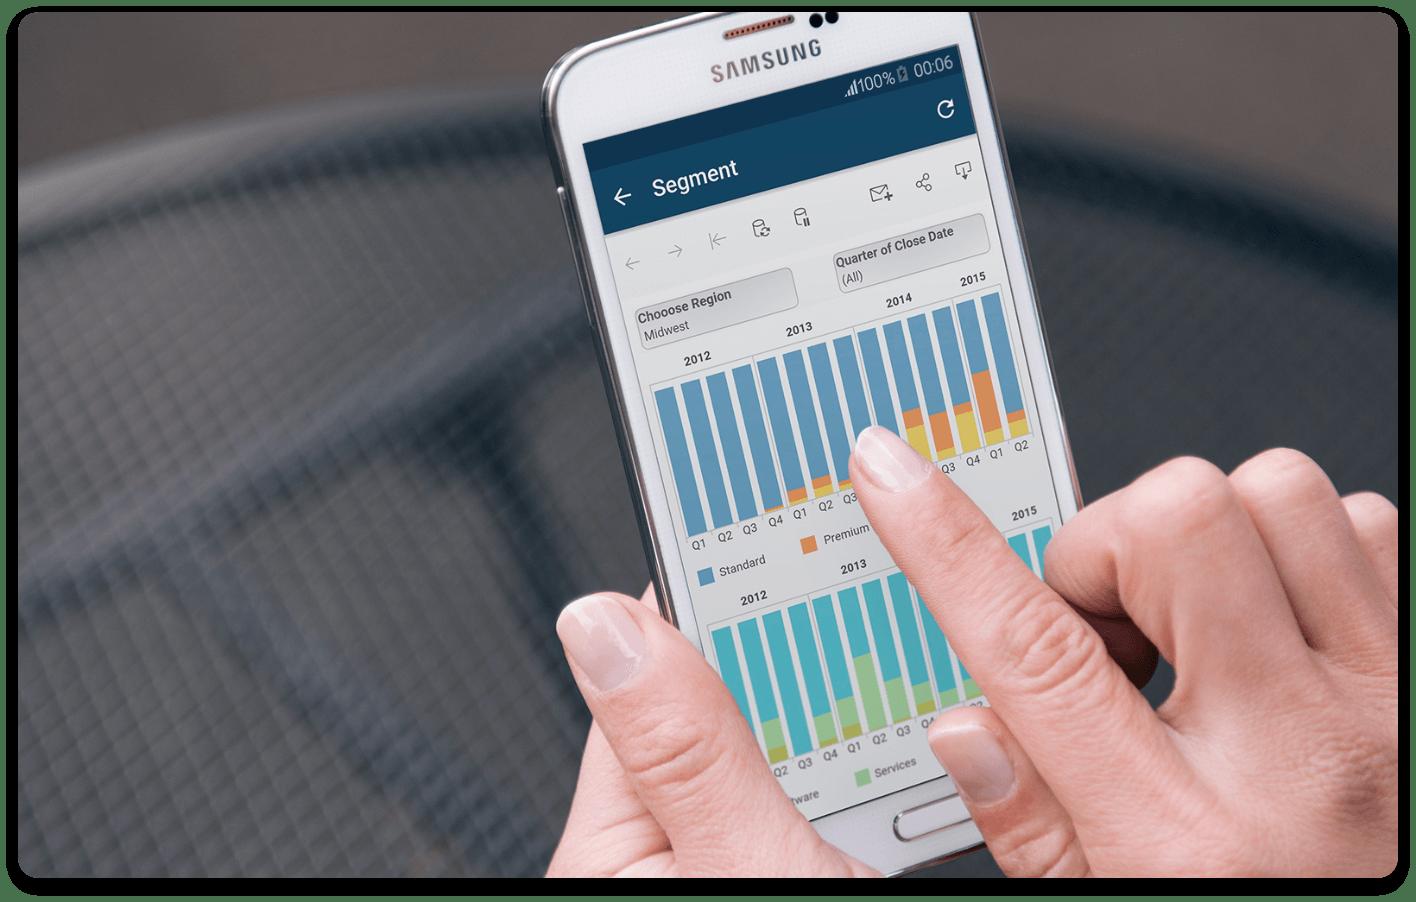 Tableau dashboard on mobile